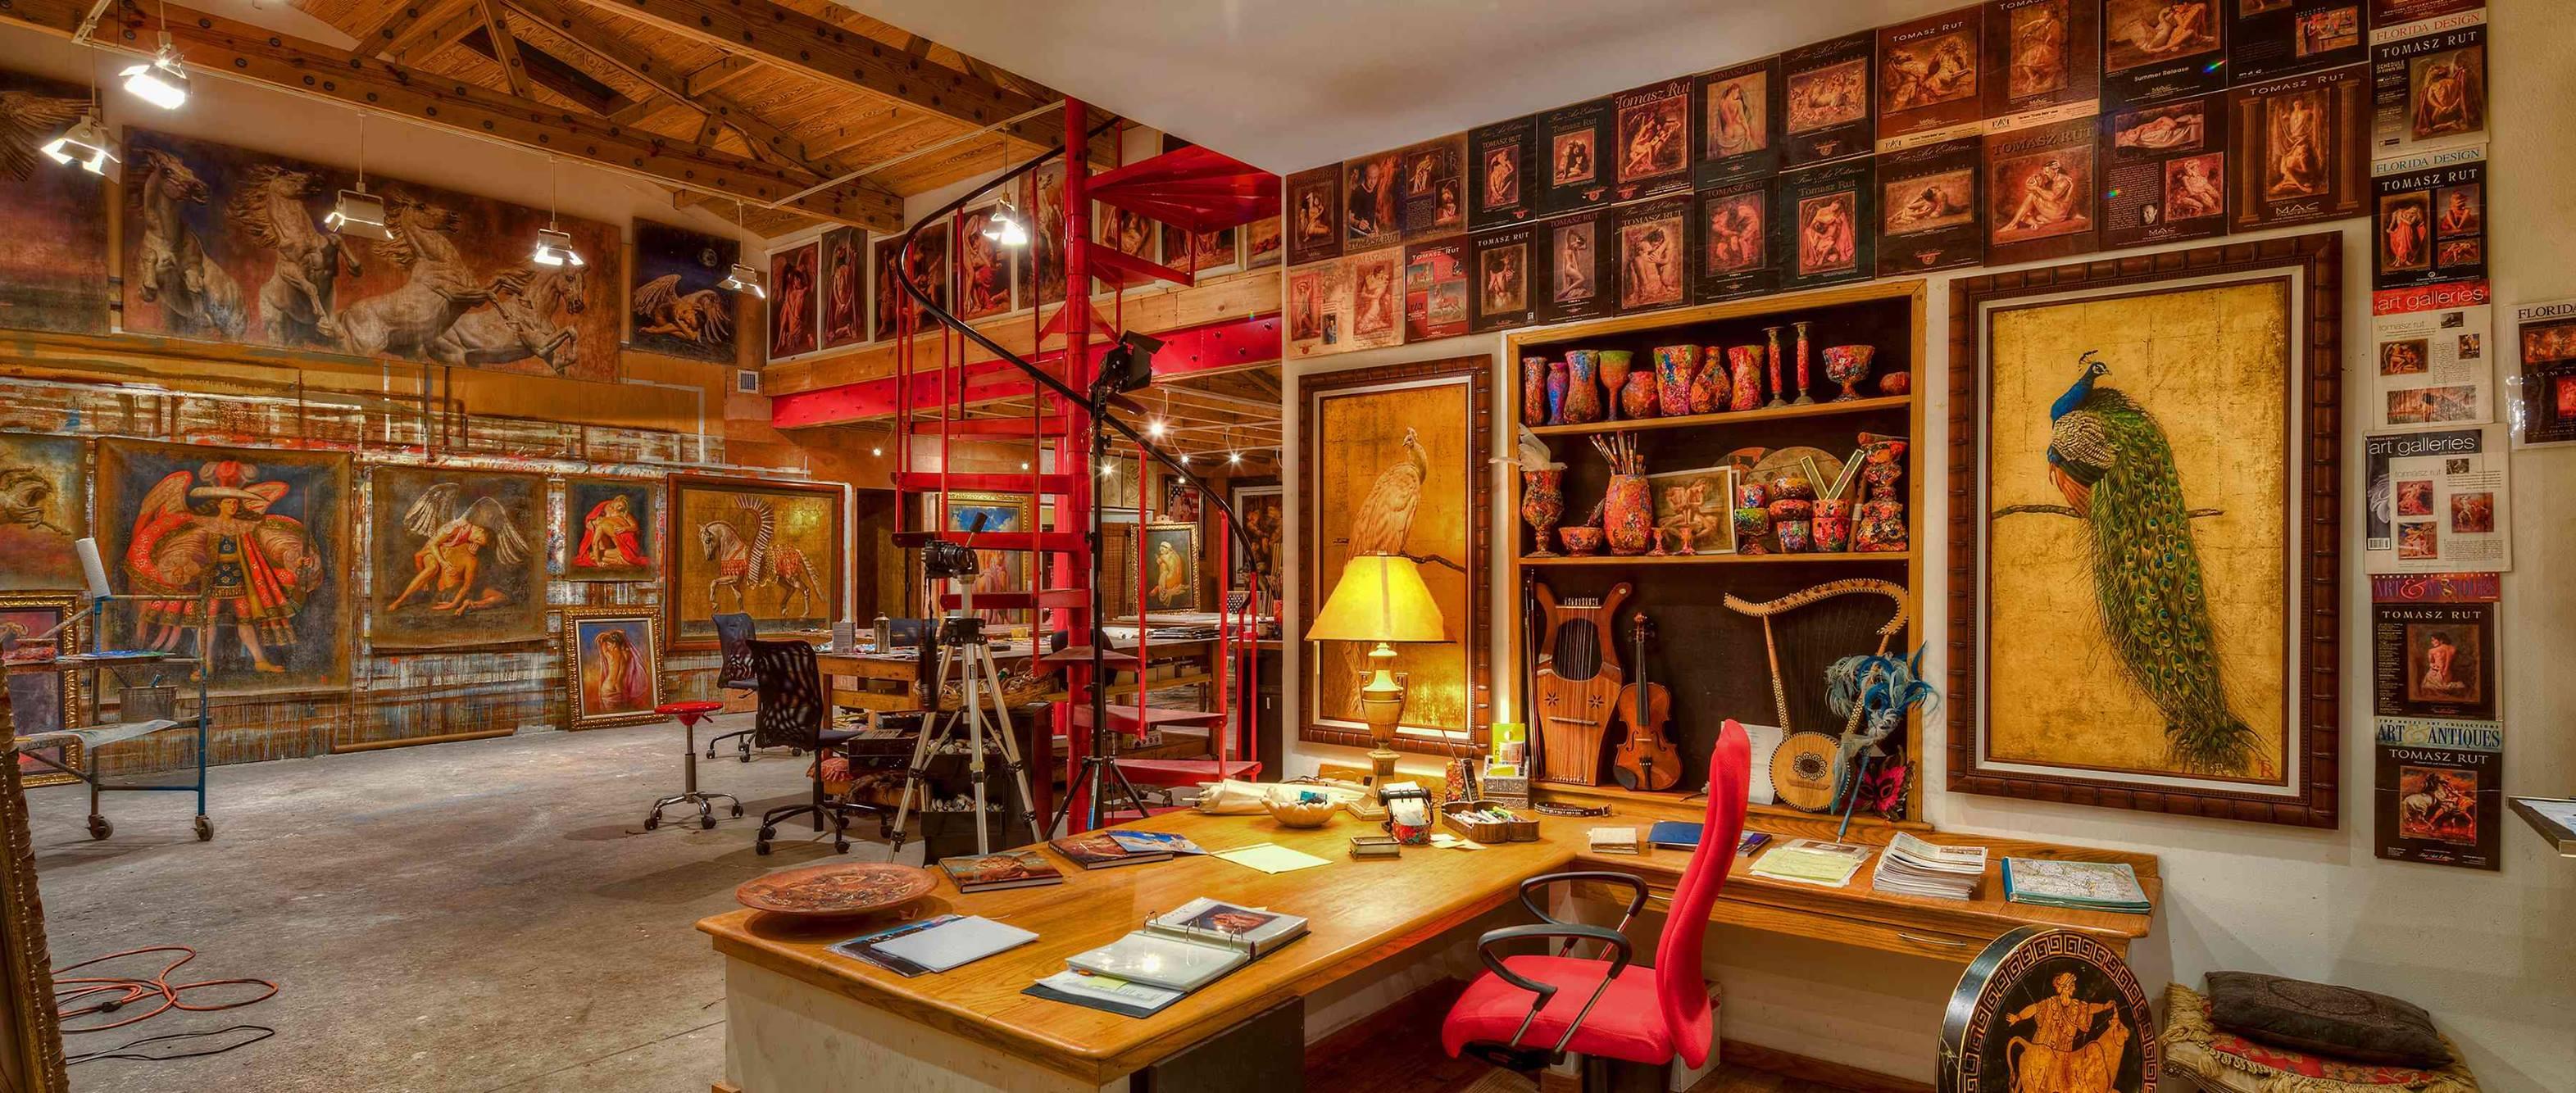 Tomasz Rut studio